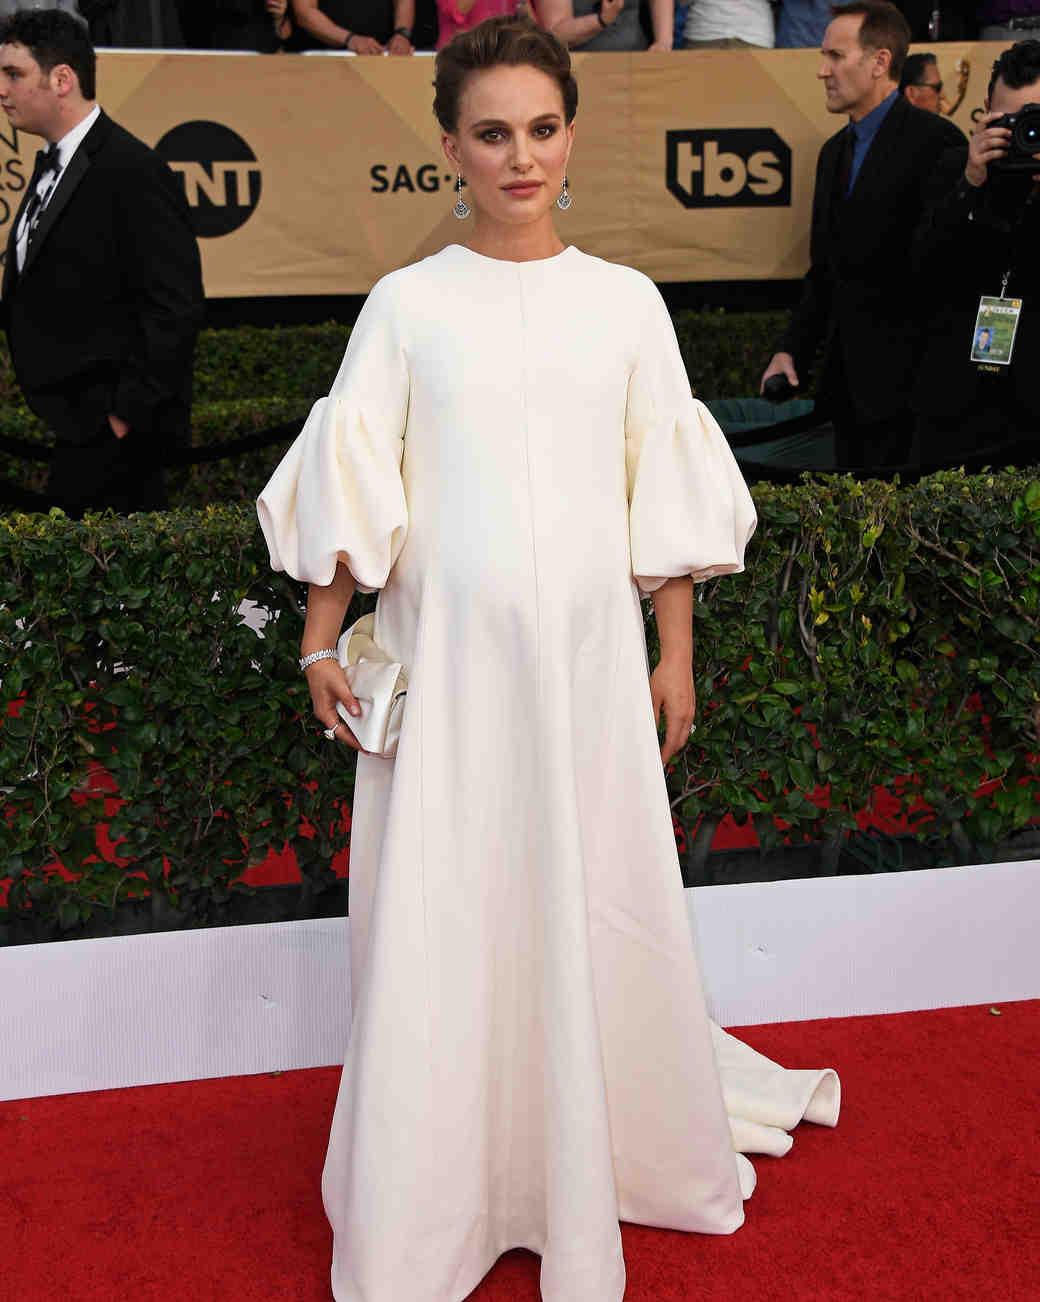 Natalie Portman Sag Awards 2017